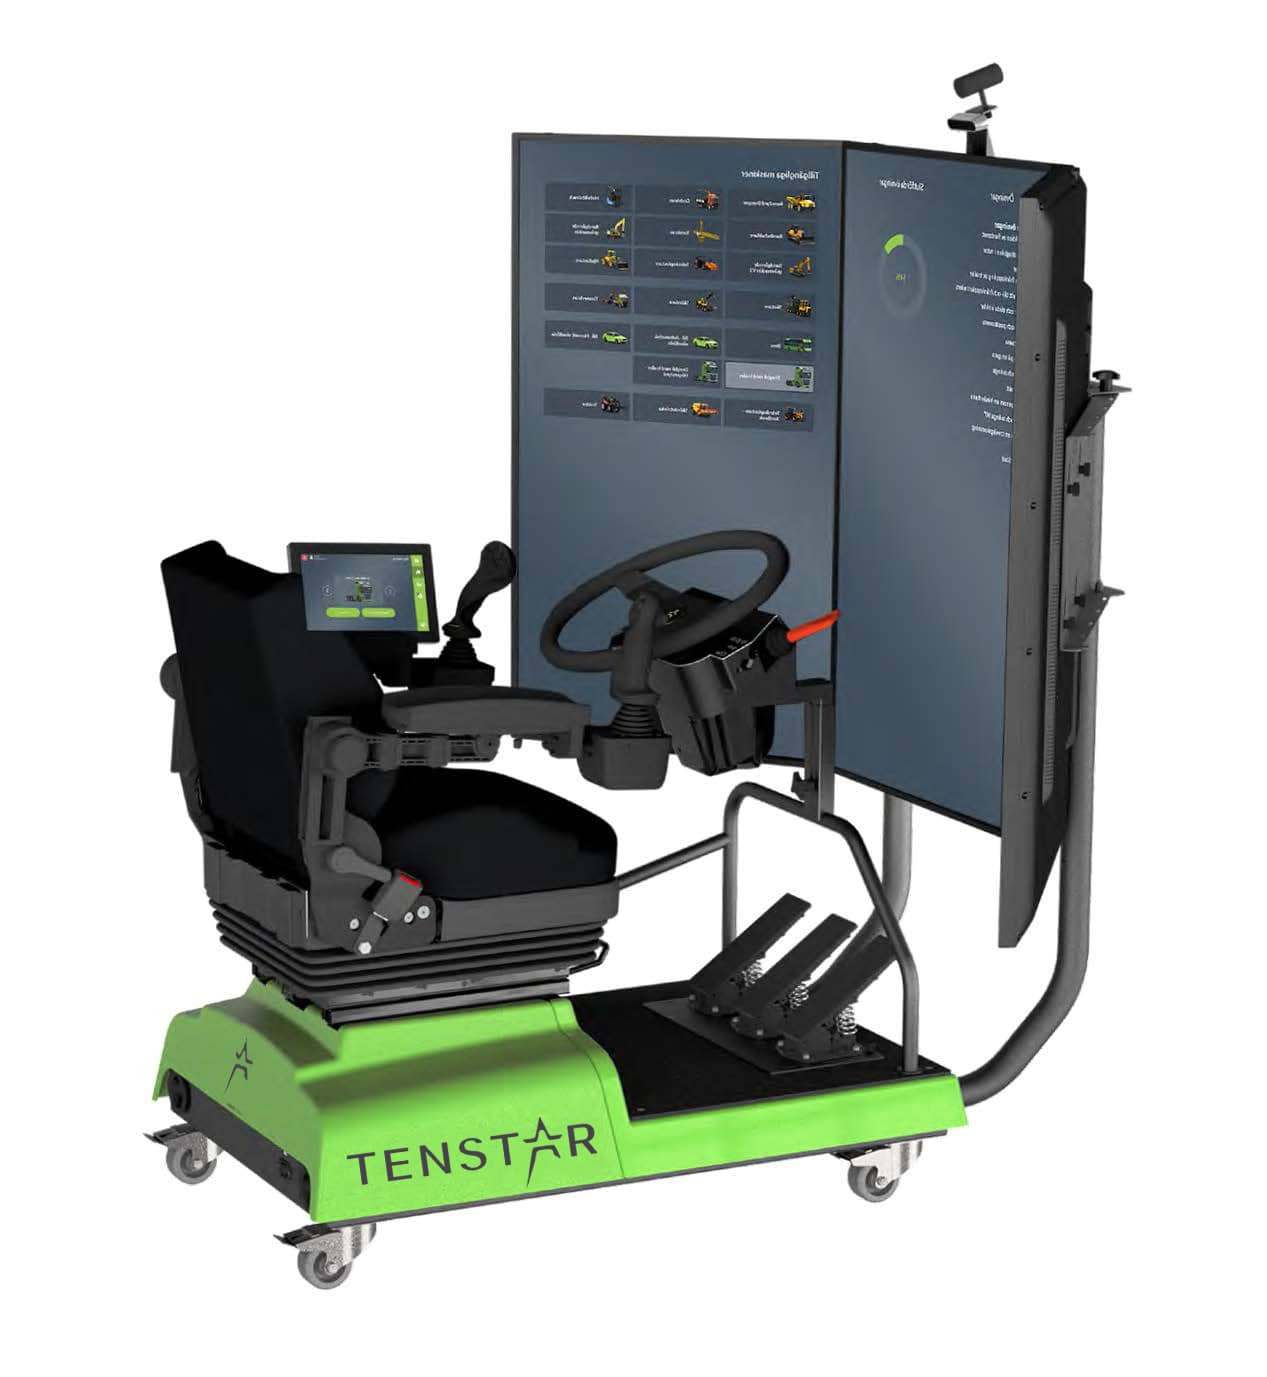 Tenstar simulator | HK Simulatoren